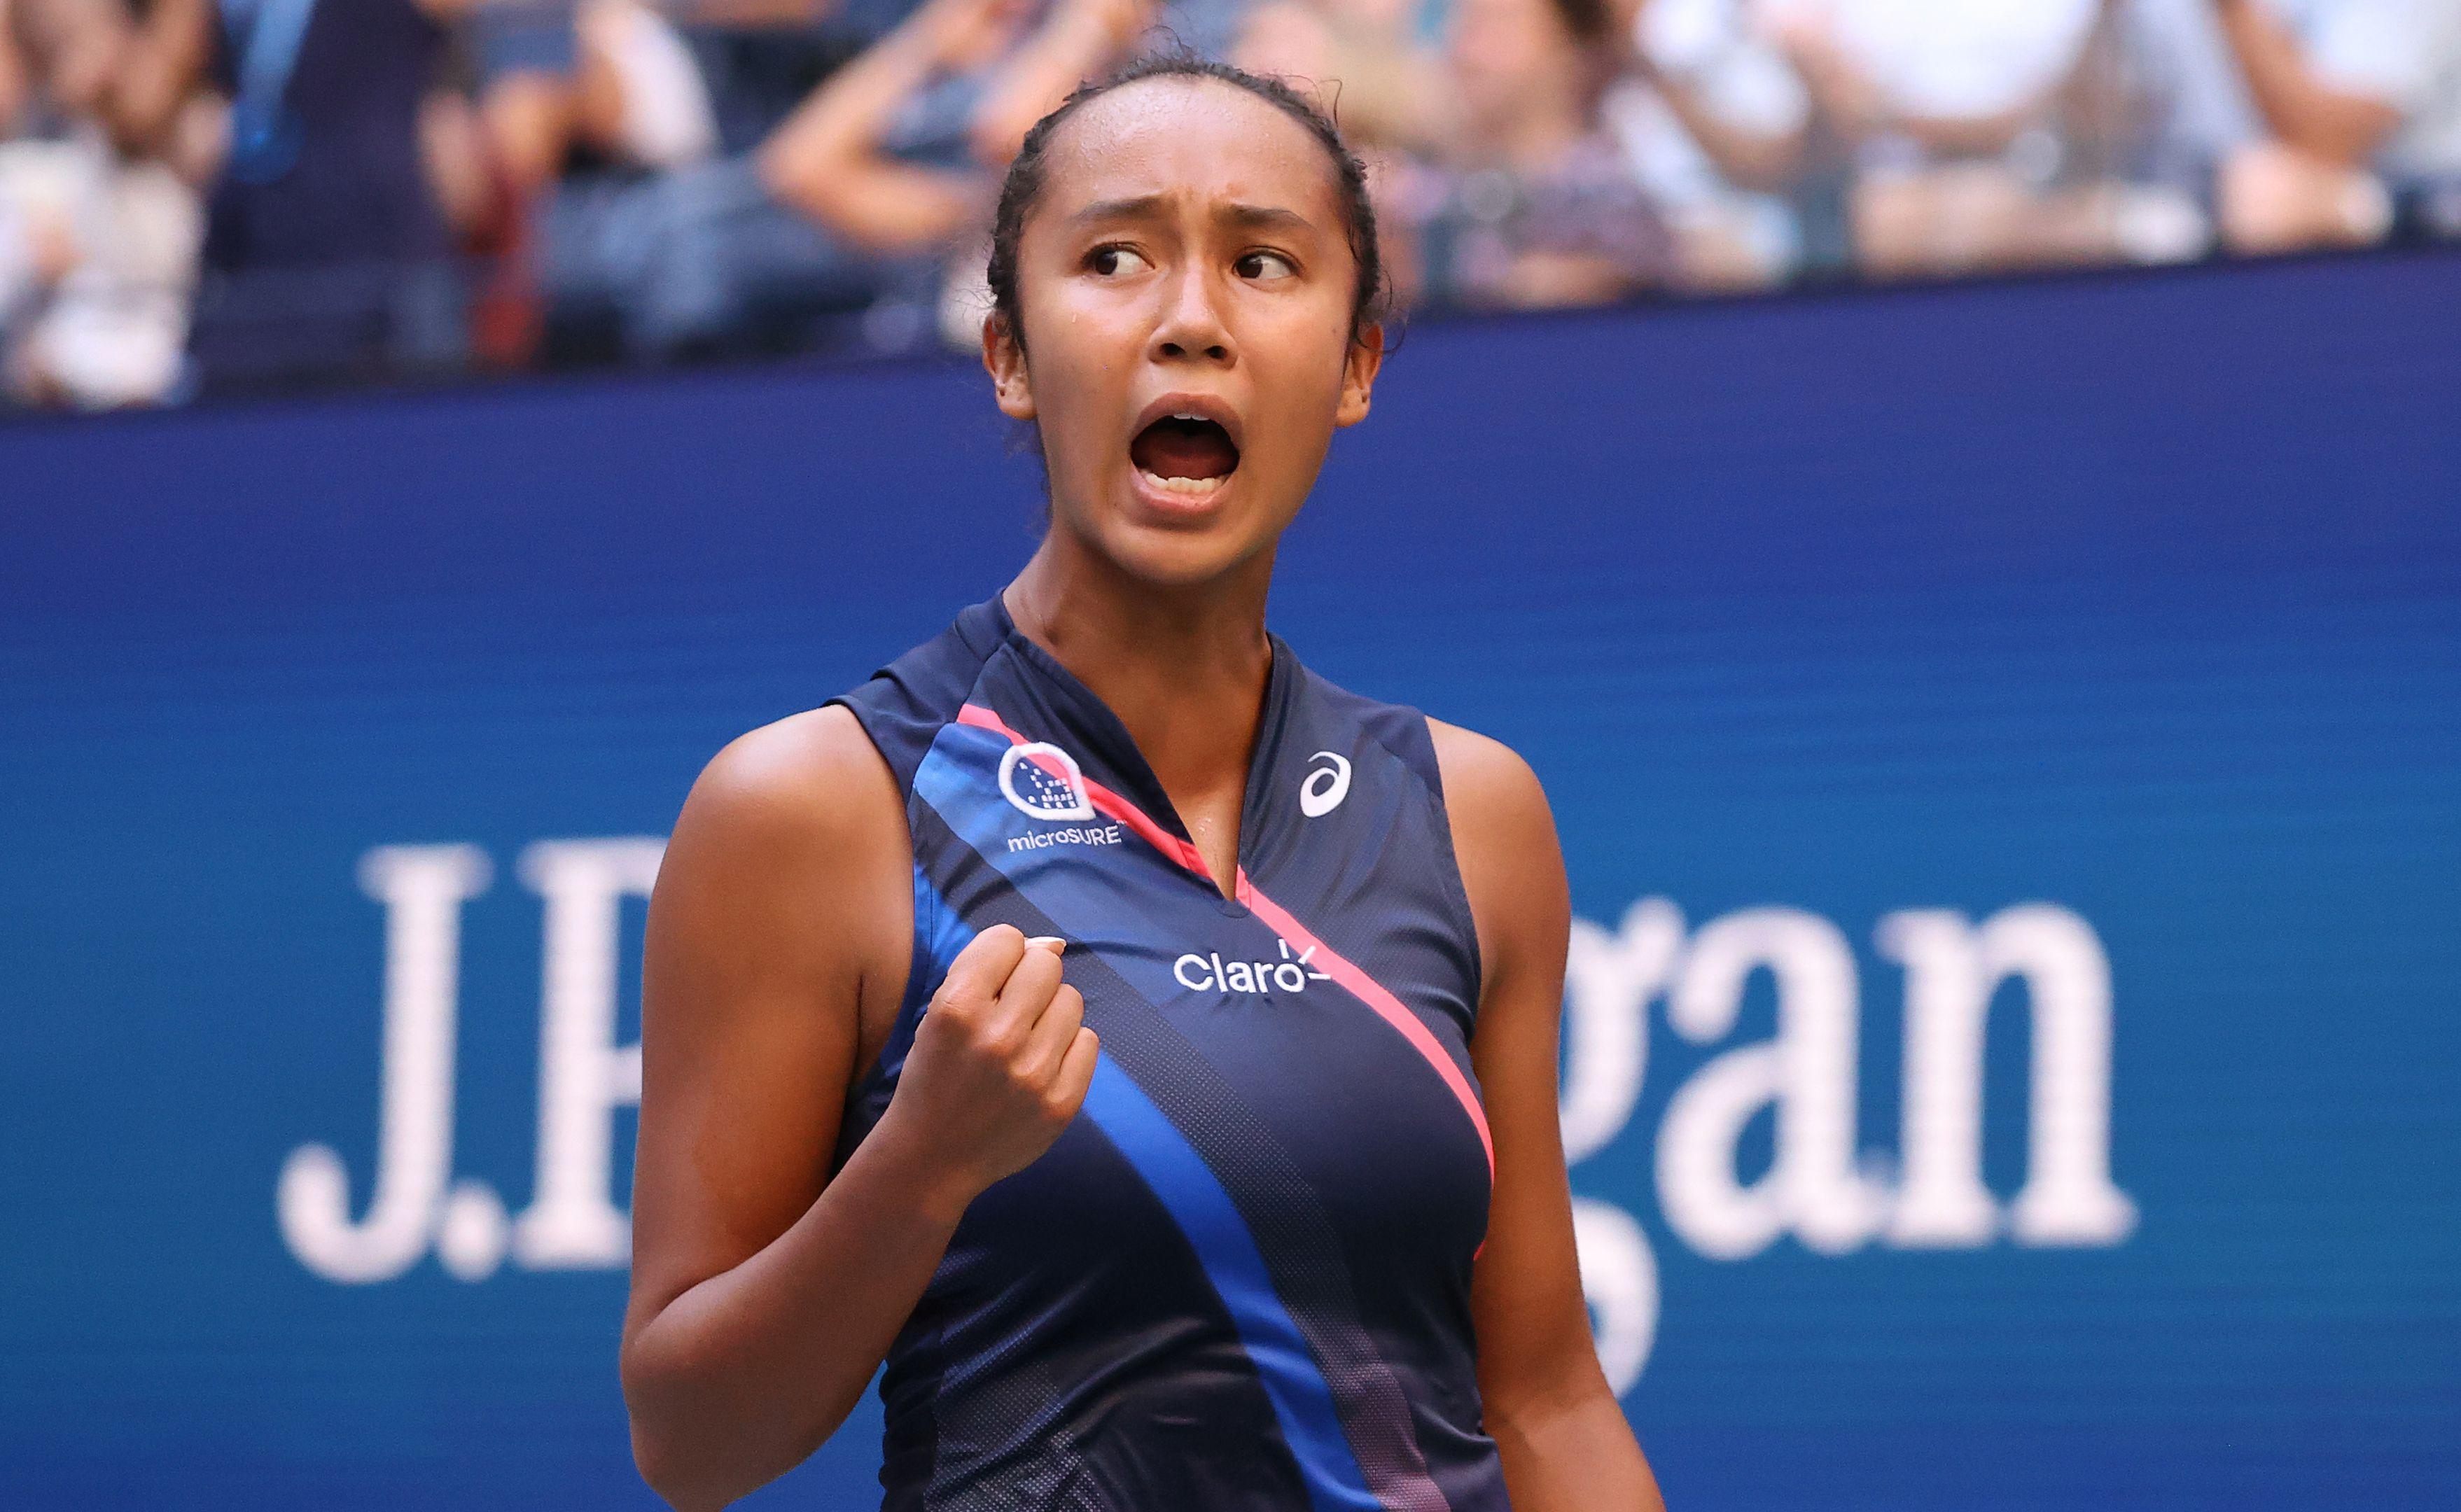 US tennis great Pam Shriver accuses Leylah Fernandez's team of coaching in US Open semi-final